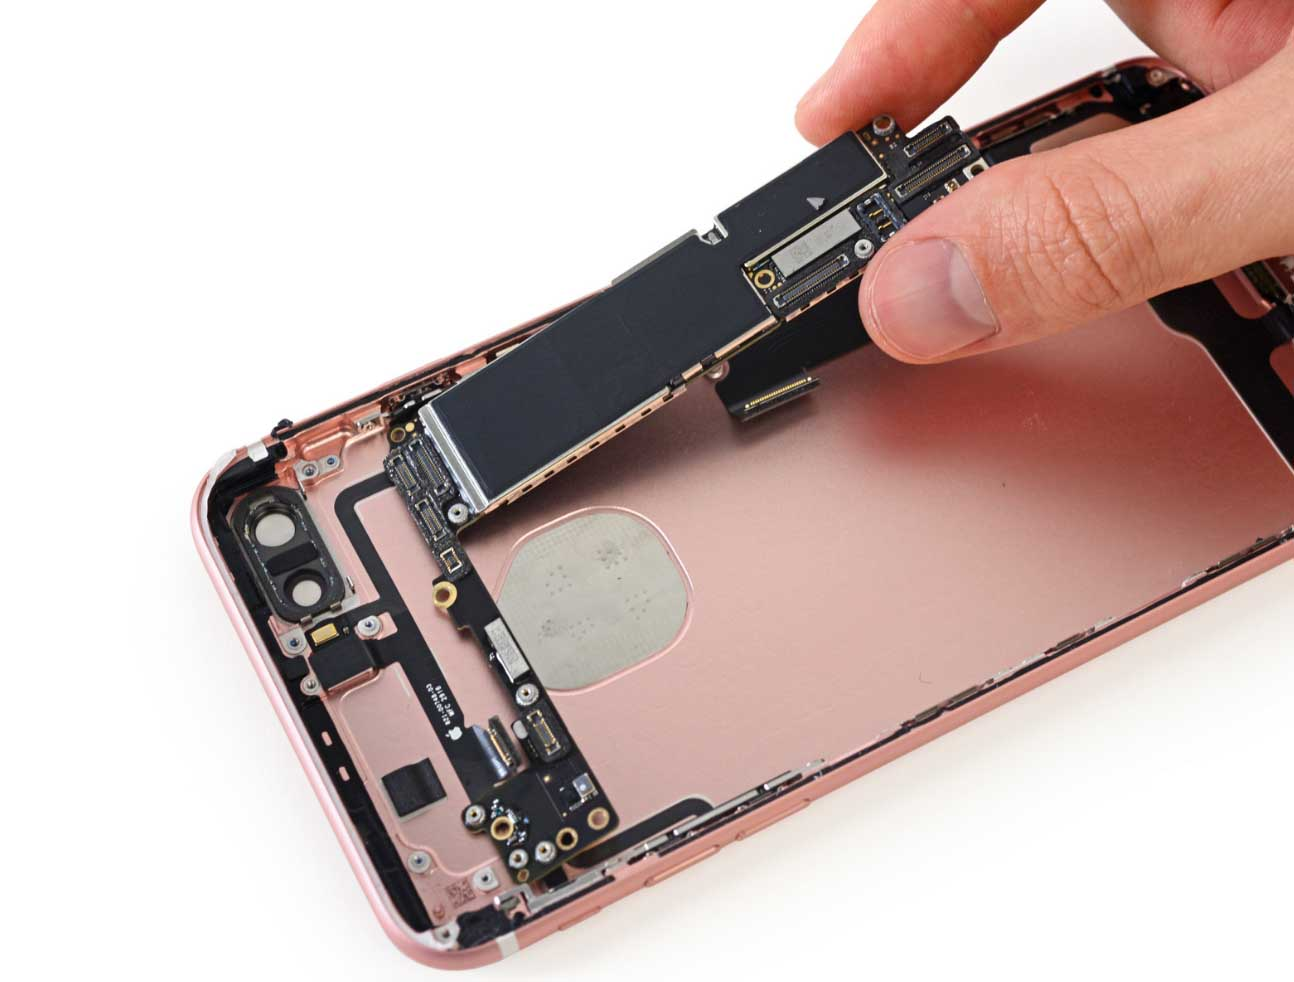 Ifixit Teardown Of Iphone 7 Plus Reveals The Larger